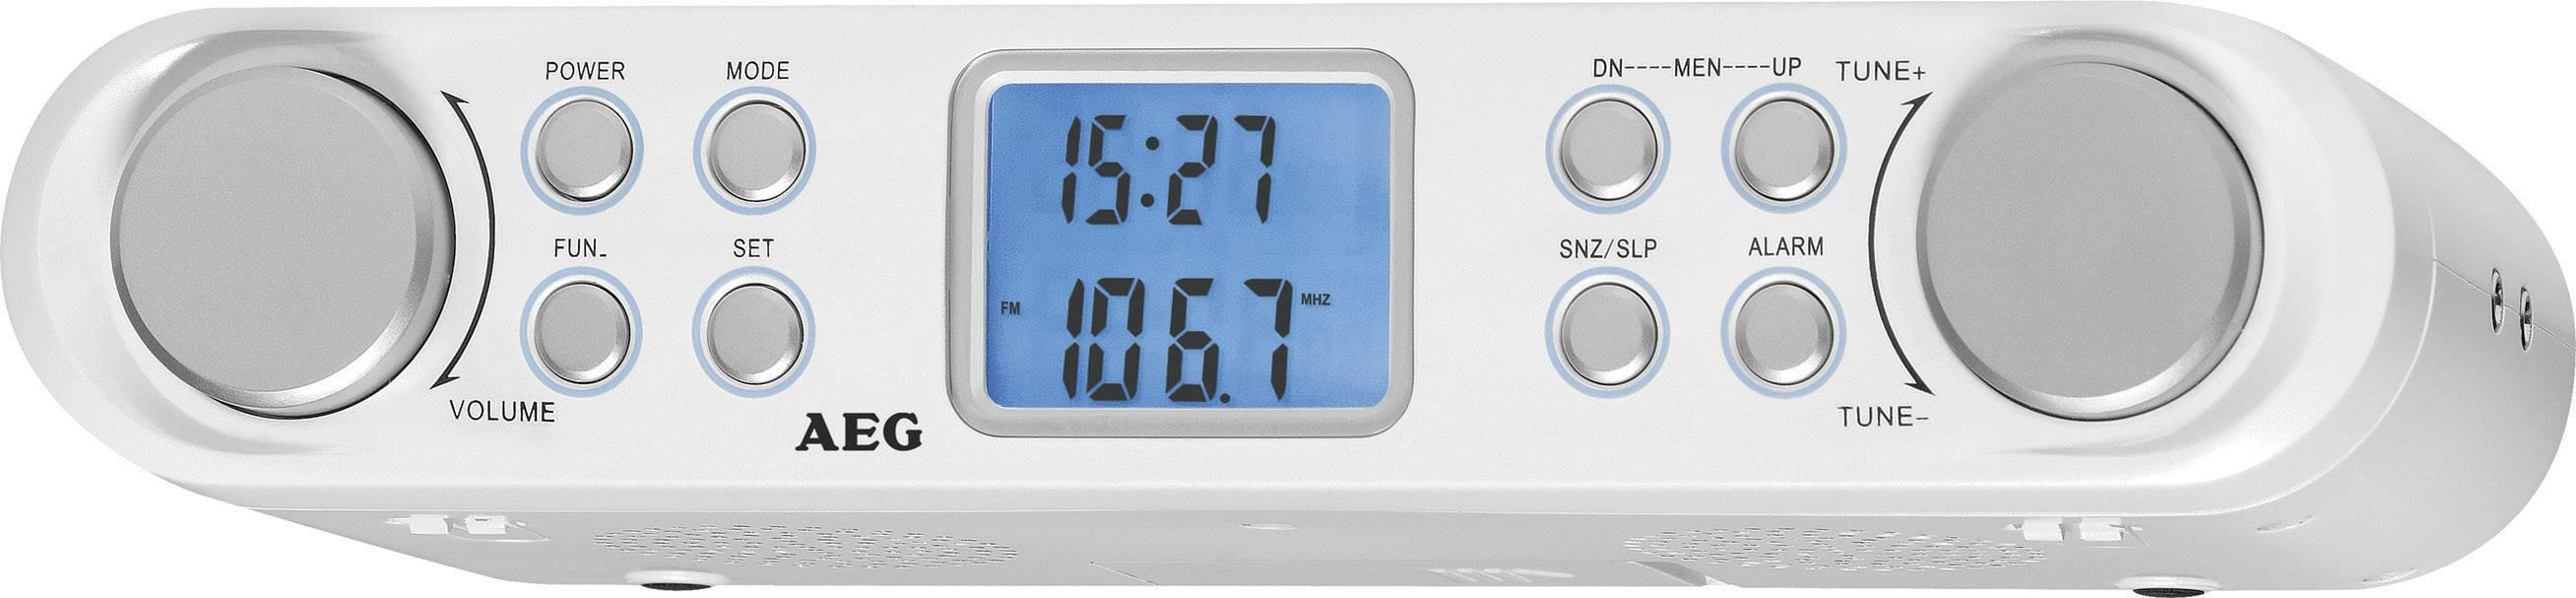 FM závesné rádio do kuchyne AEG KRC 4344, UKW, biela